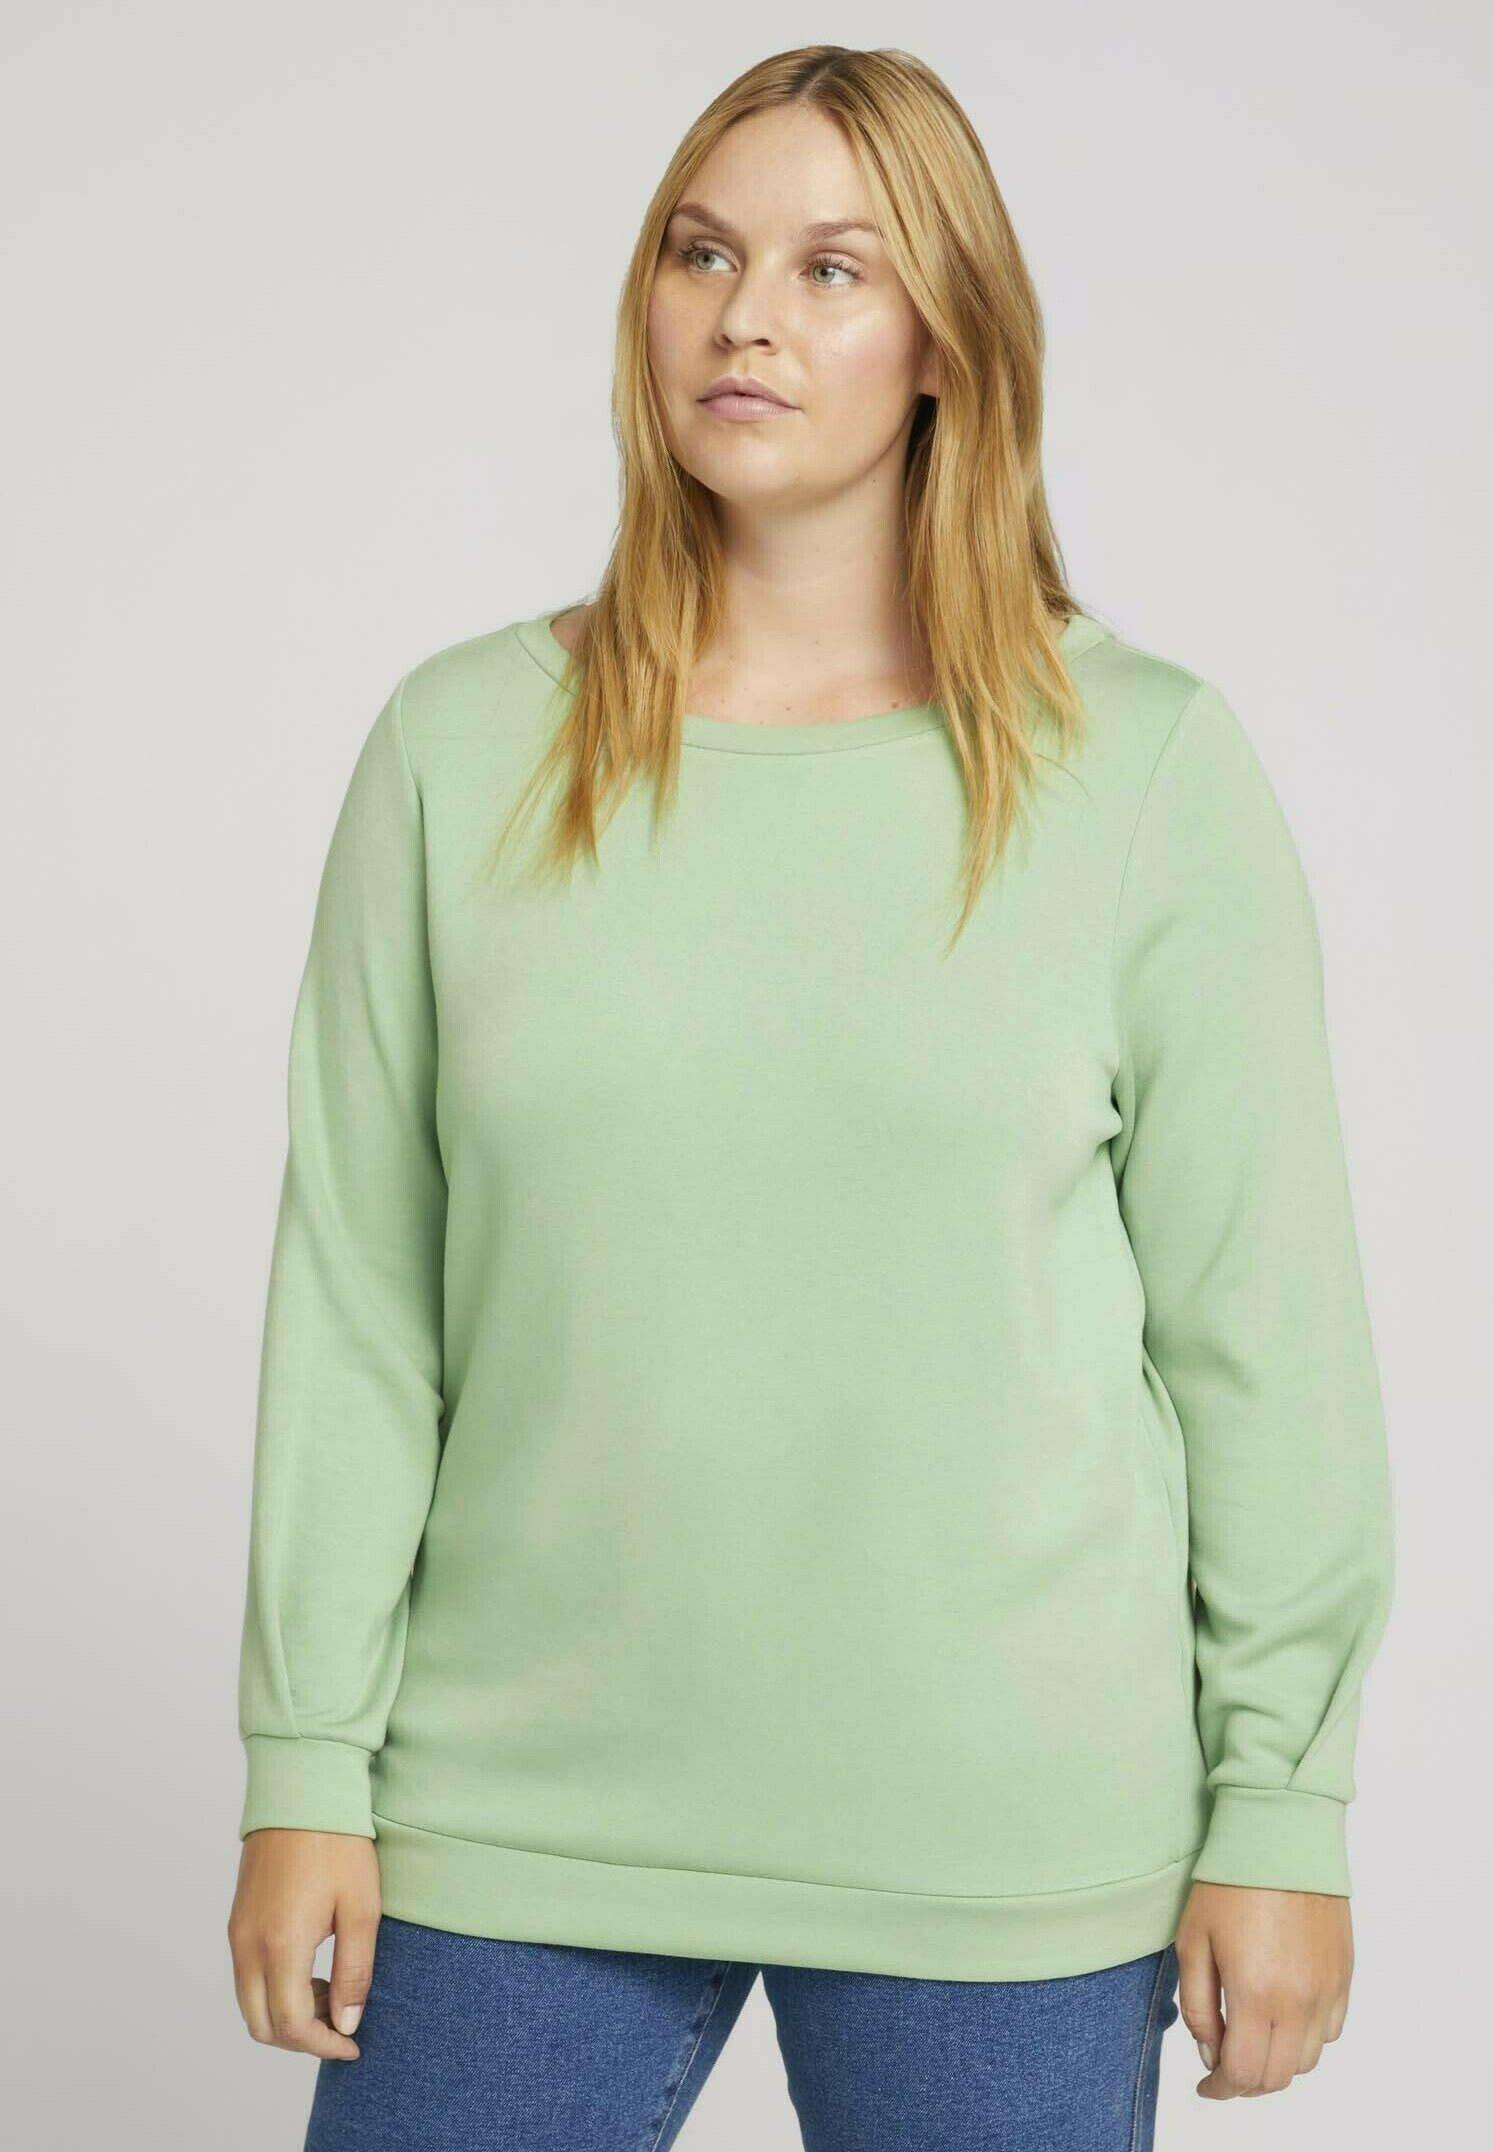 Femme ÄRMELAUFSCHLAG - Sweatshirt